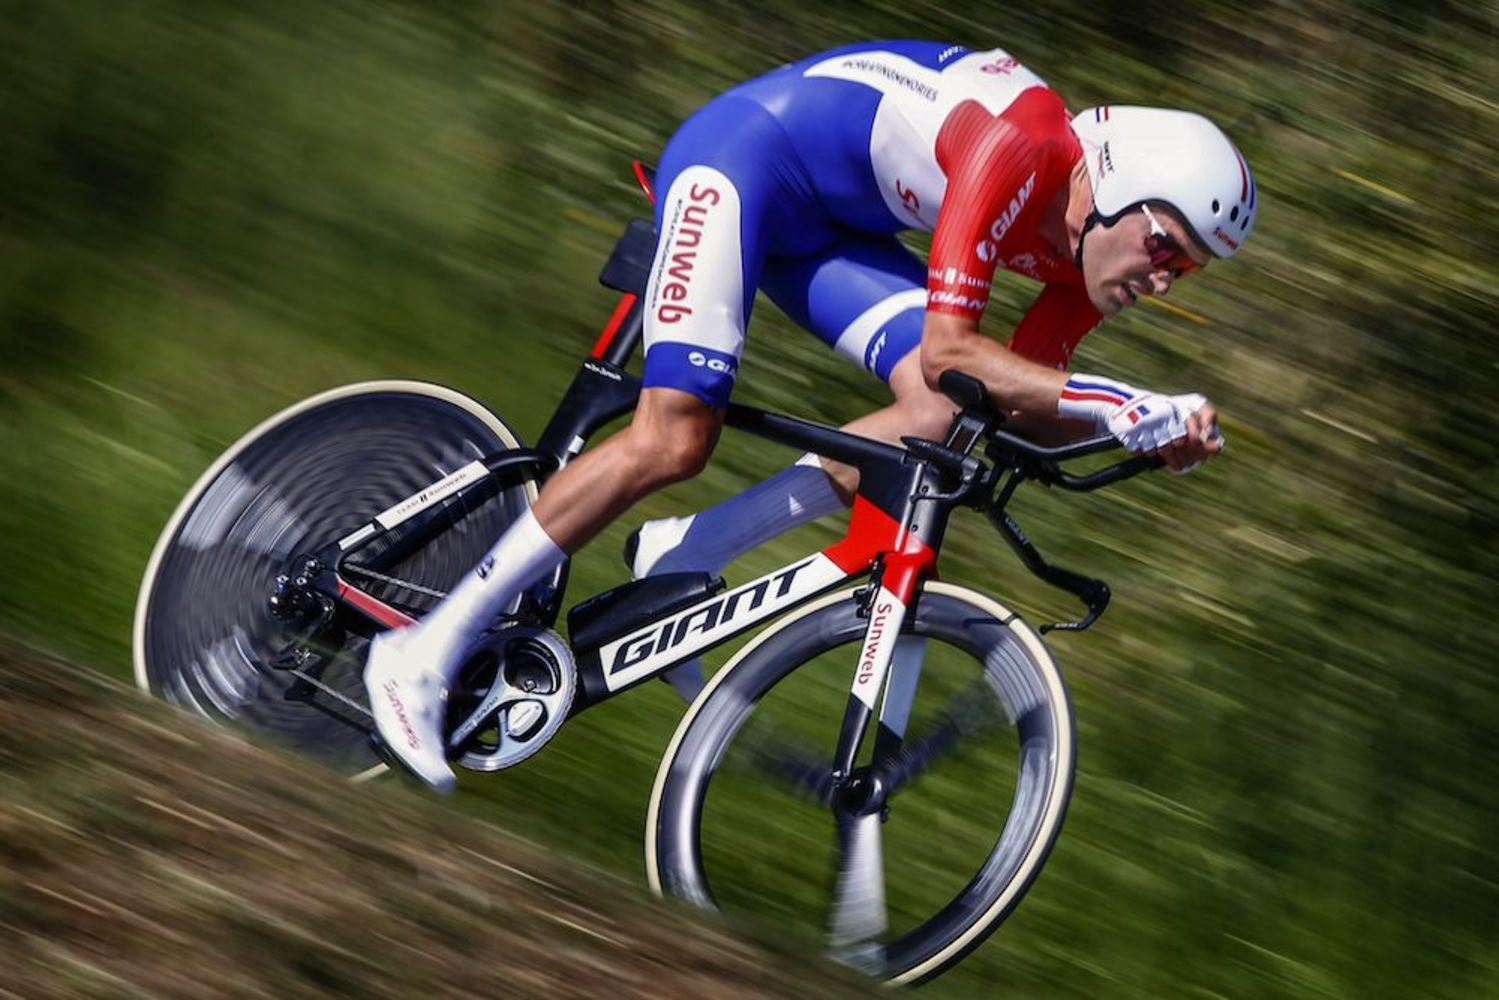 Team Sunweb - Giant Bicycles | Ireland